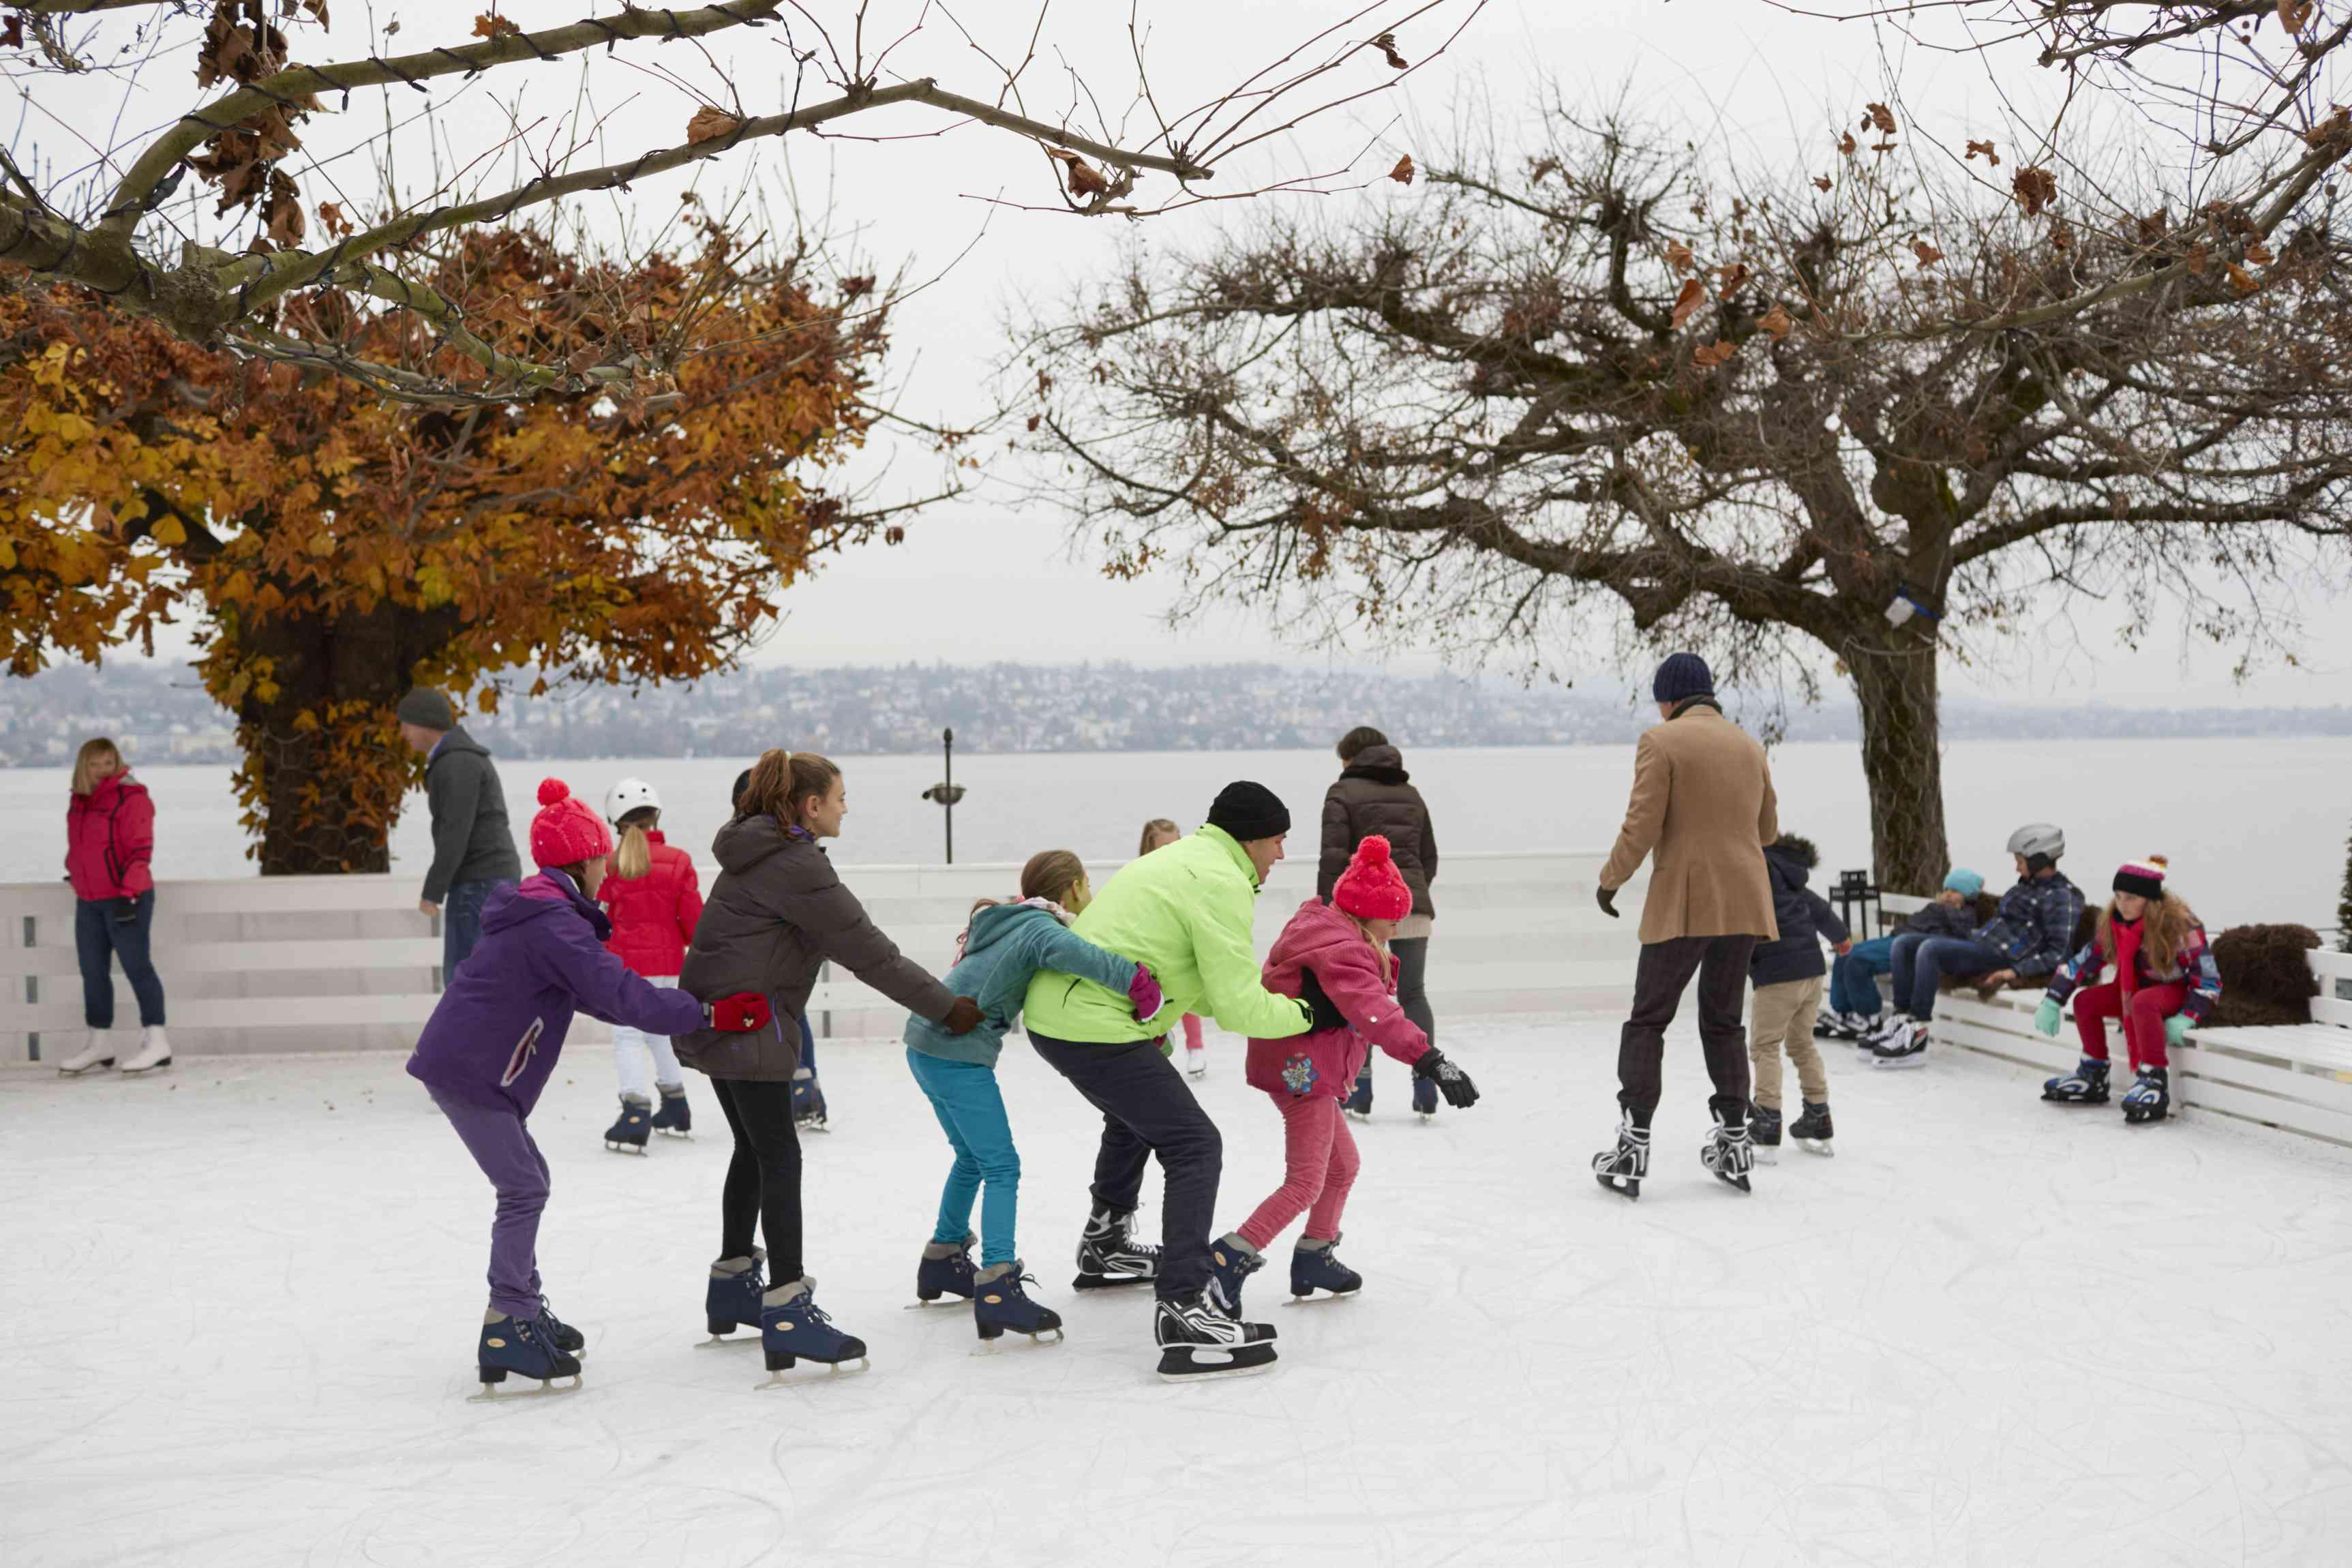 Ice-skating at Romantik Seehotel Sonne